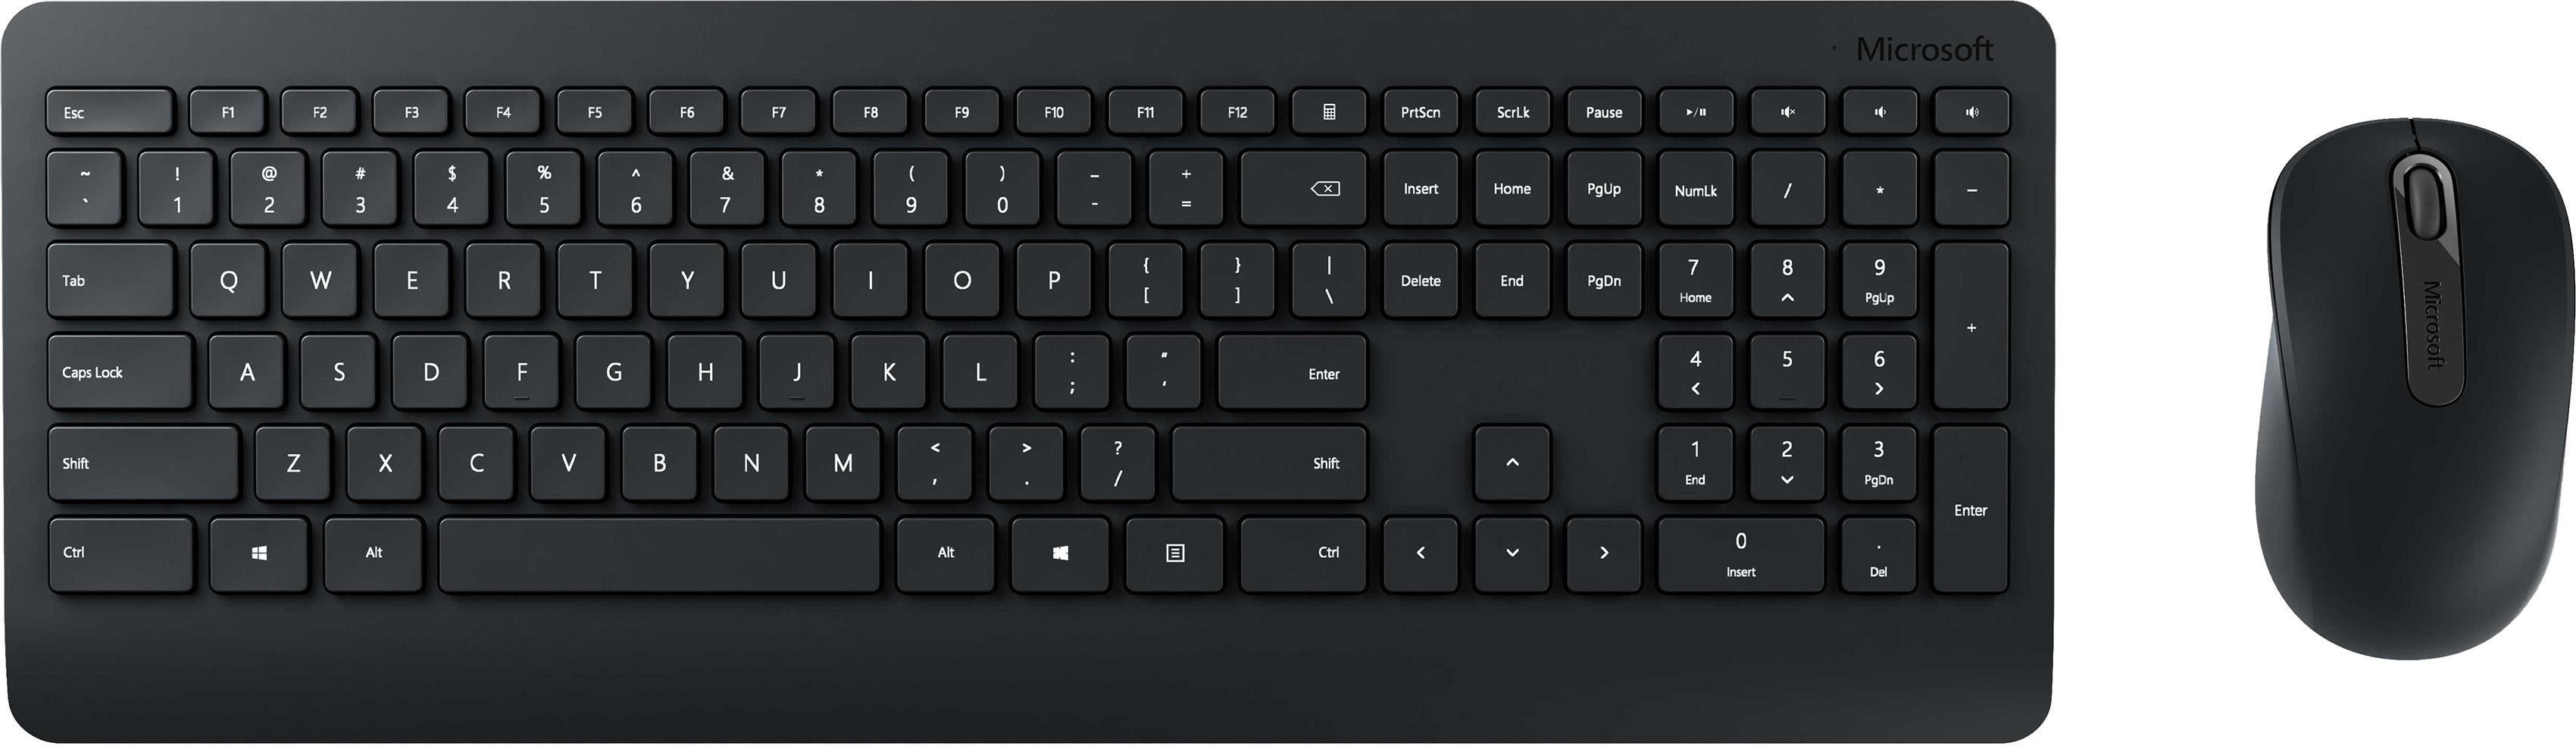 Microsoft Wireless Desktop 900 Tastatur